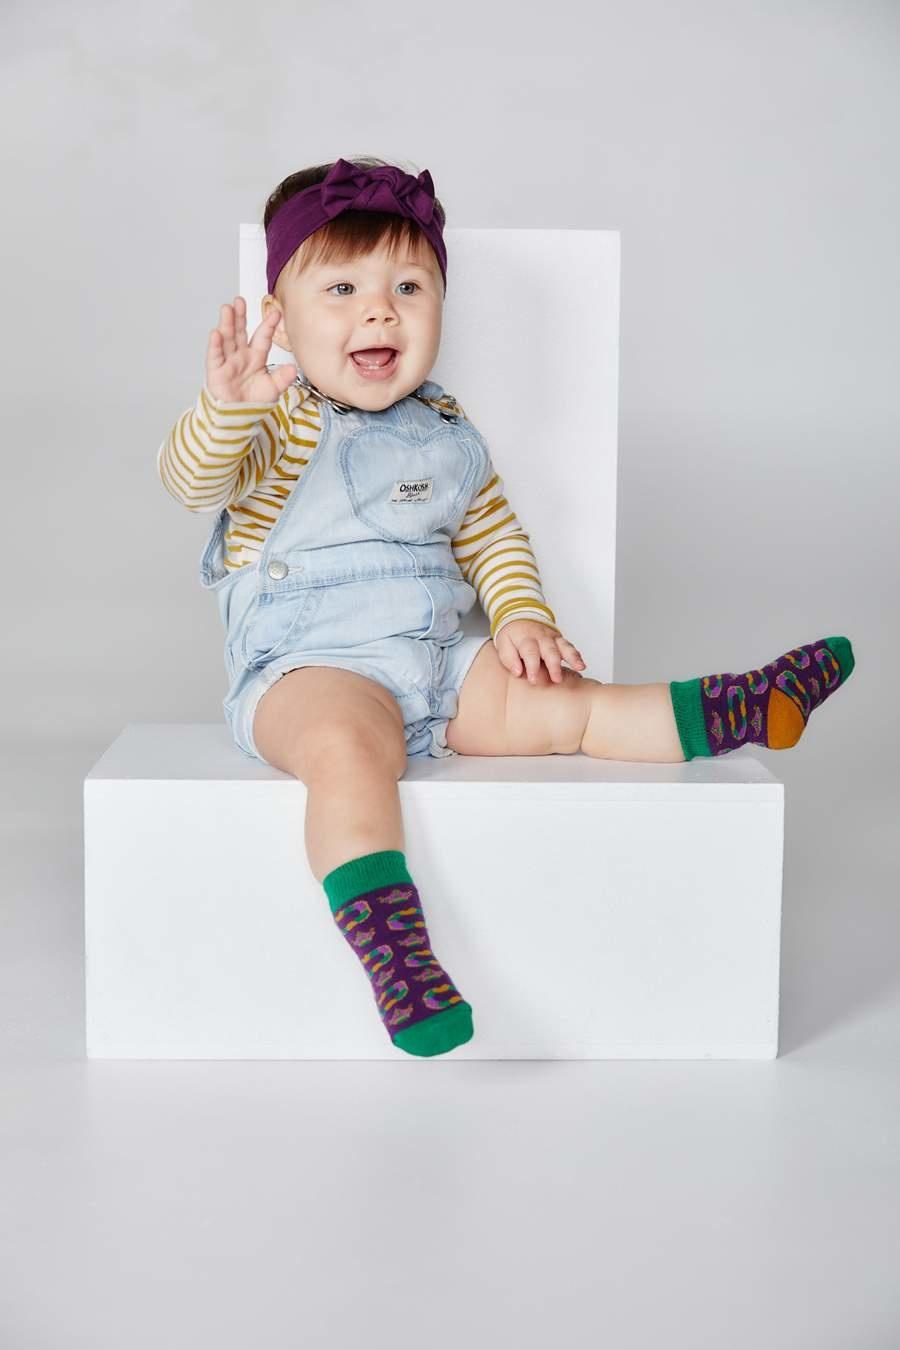 Bonfolk Bonfolk Buy One Give One Socks - Baby King Cake (0-12 mo)